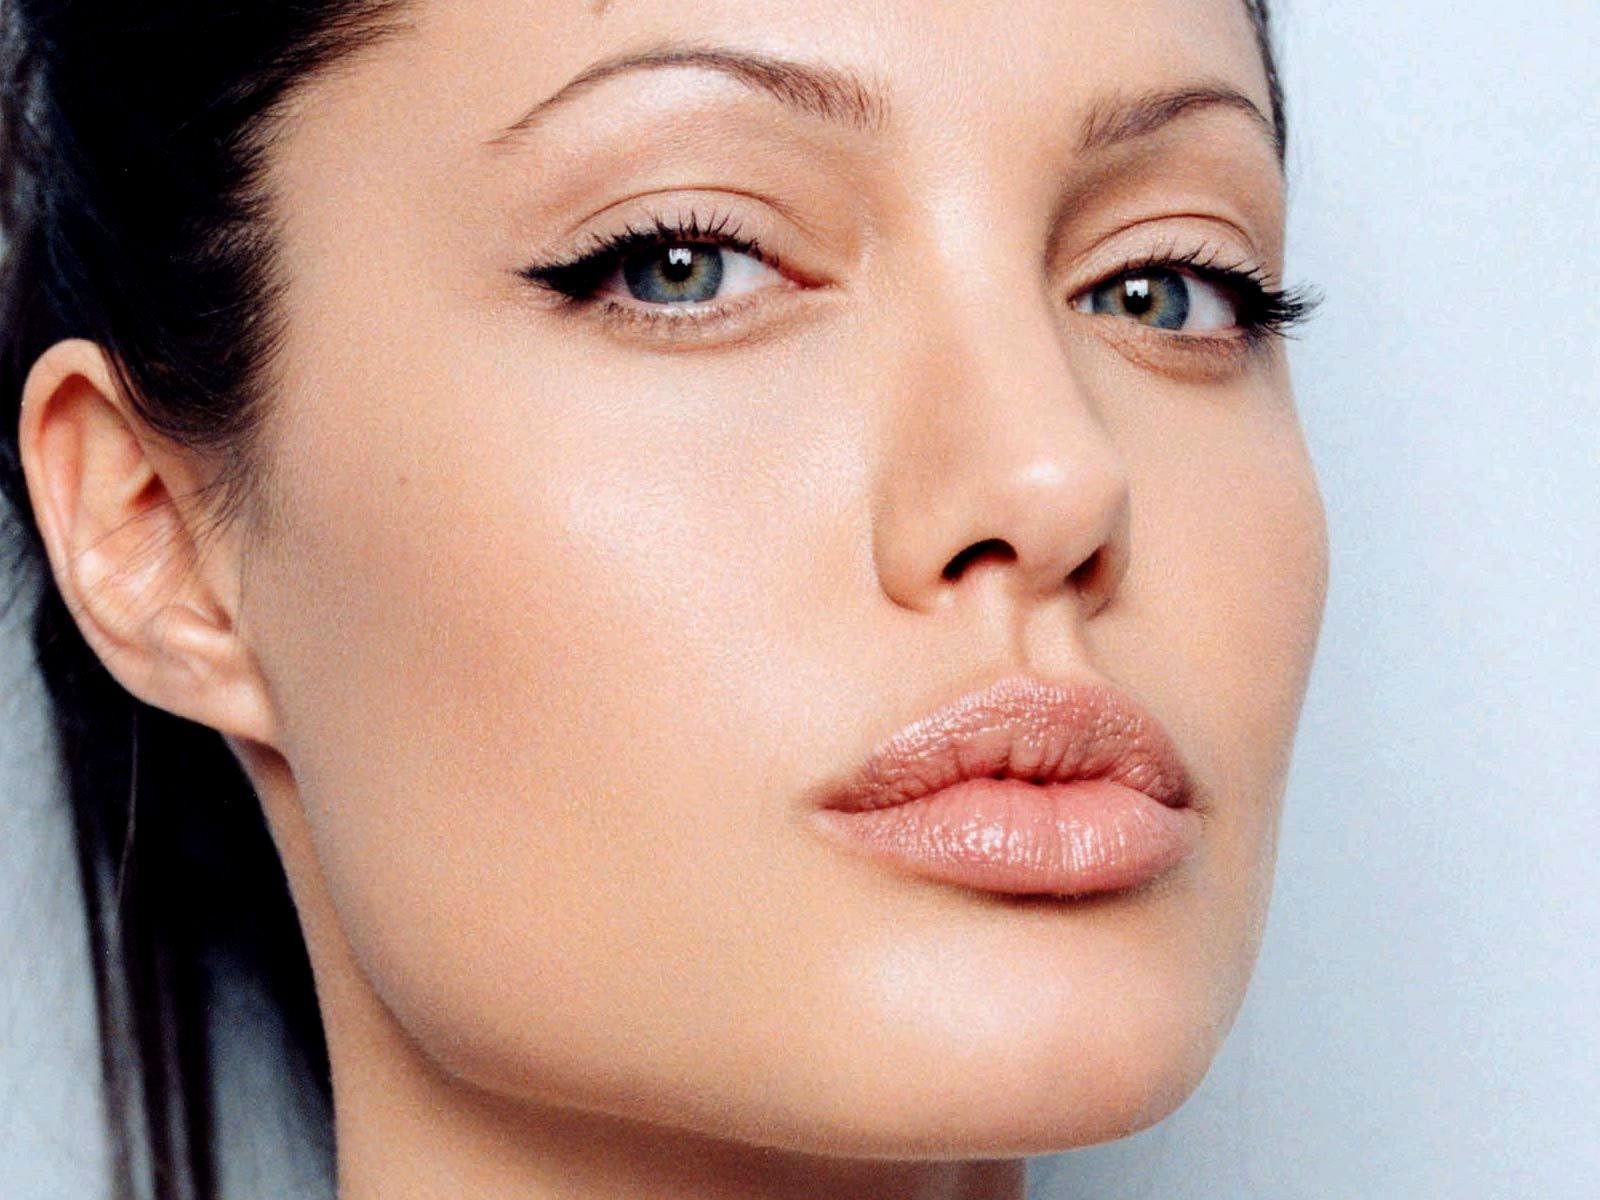 http://4.bp.blogspot.com/-RagiqQkqZNo/UQWIrfBRRrI/AAAAAAABLuc/UobzVxQbjOg/s1600/1159-celebrity_angelina_jolie_wallpaper.jpg